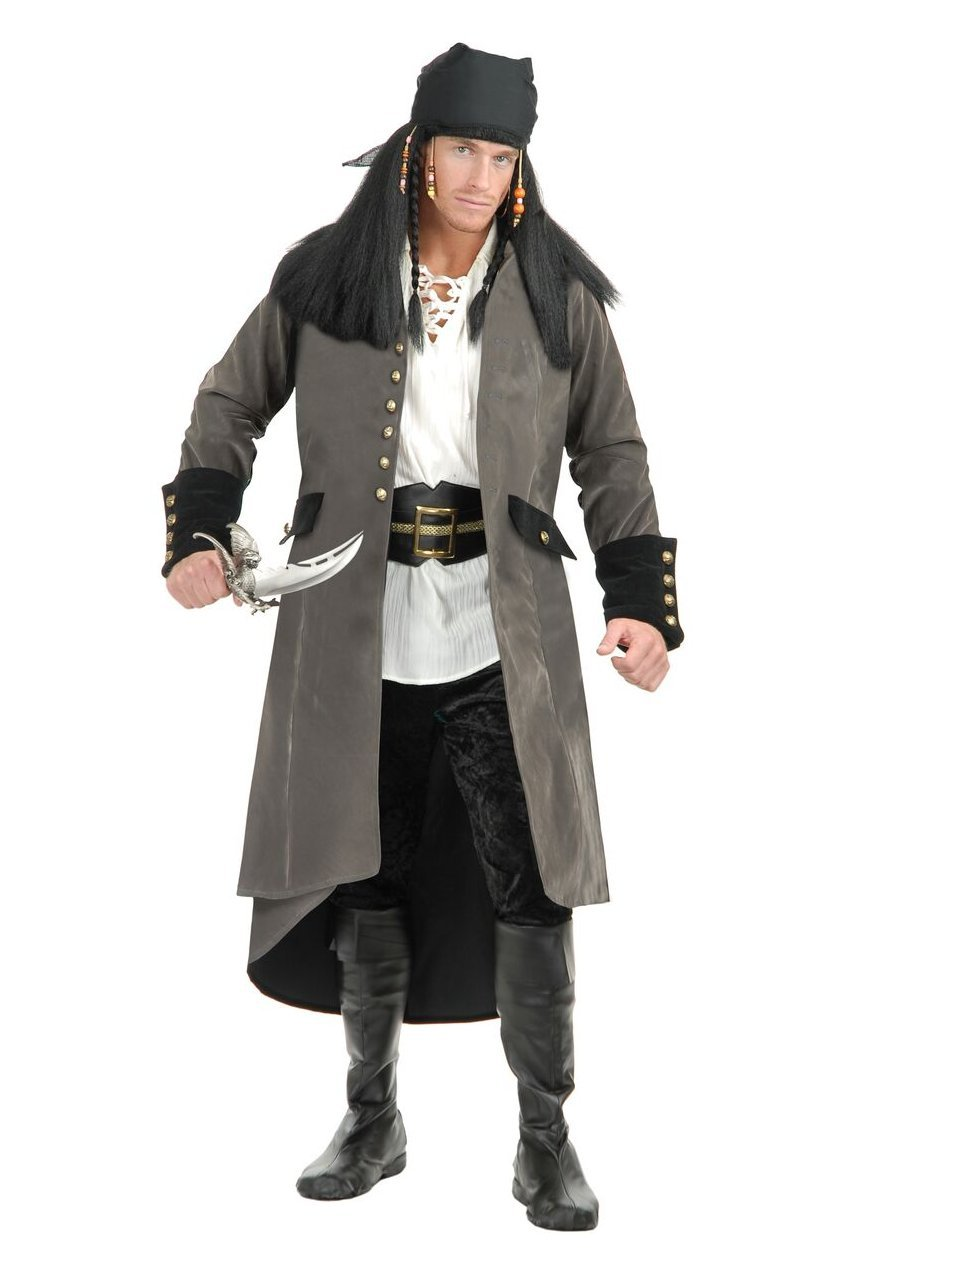 Treasure Island Pirate Adult Costume Grey - X-Large